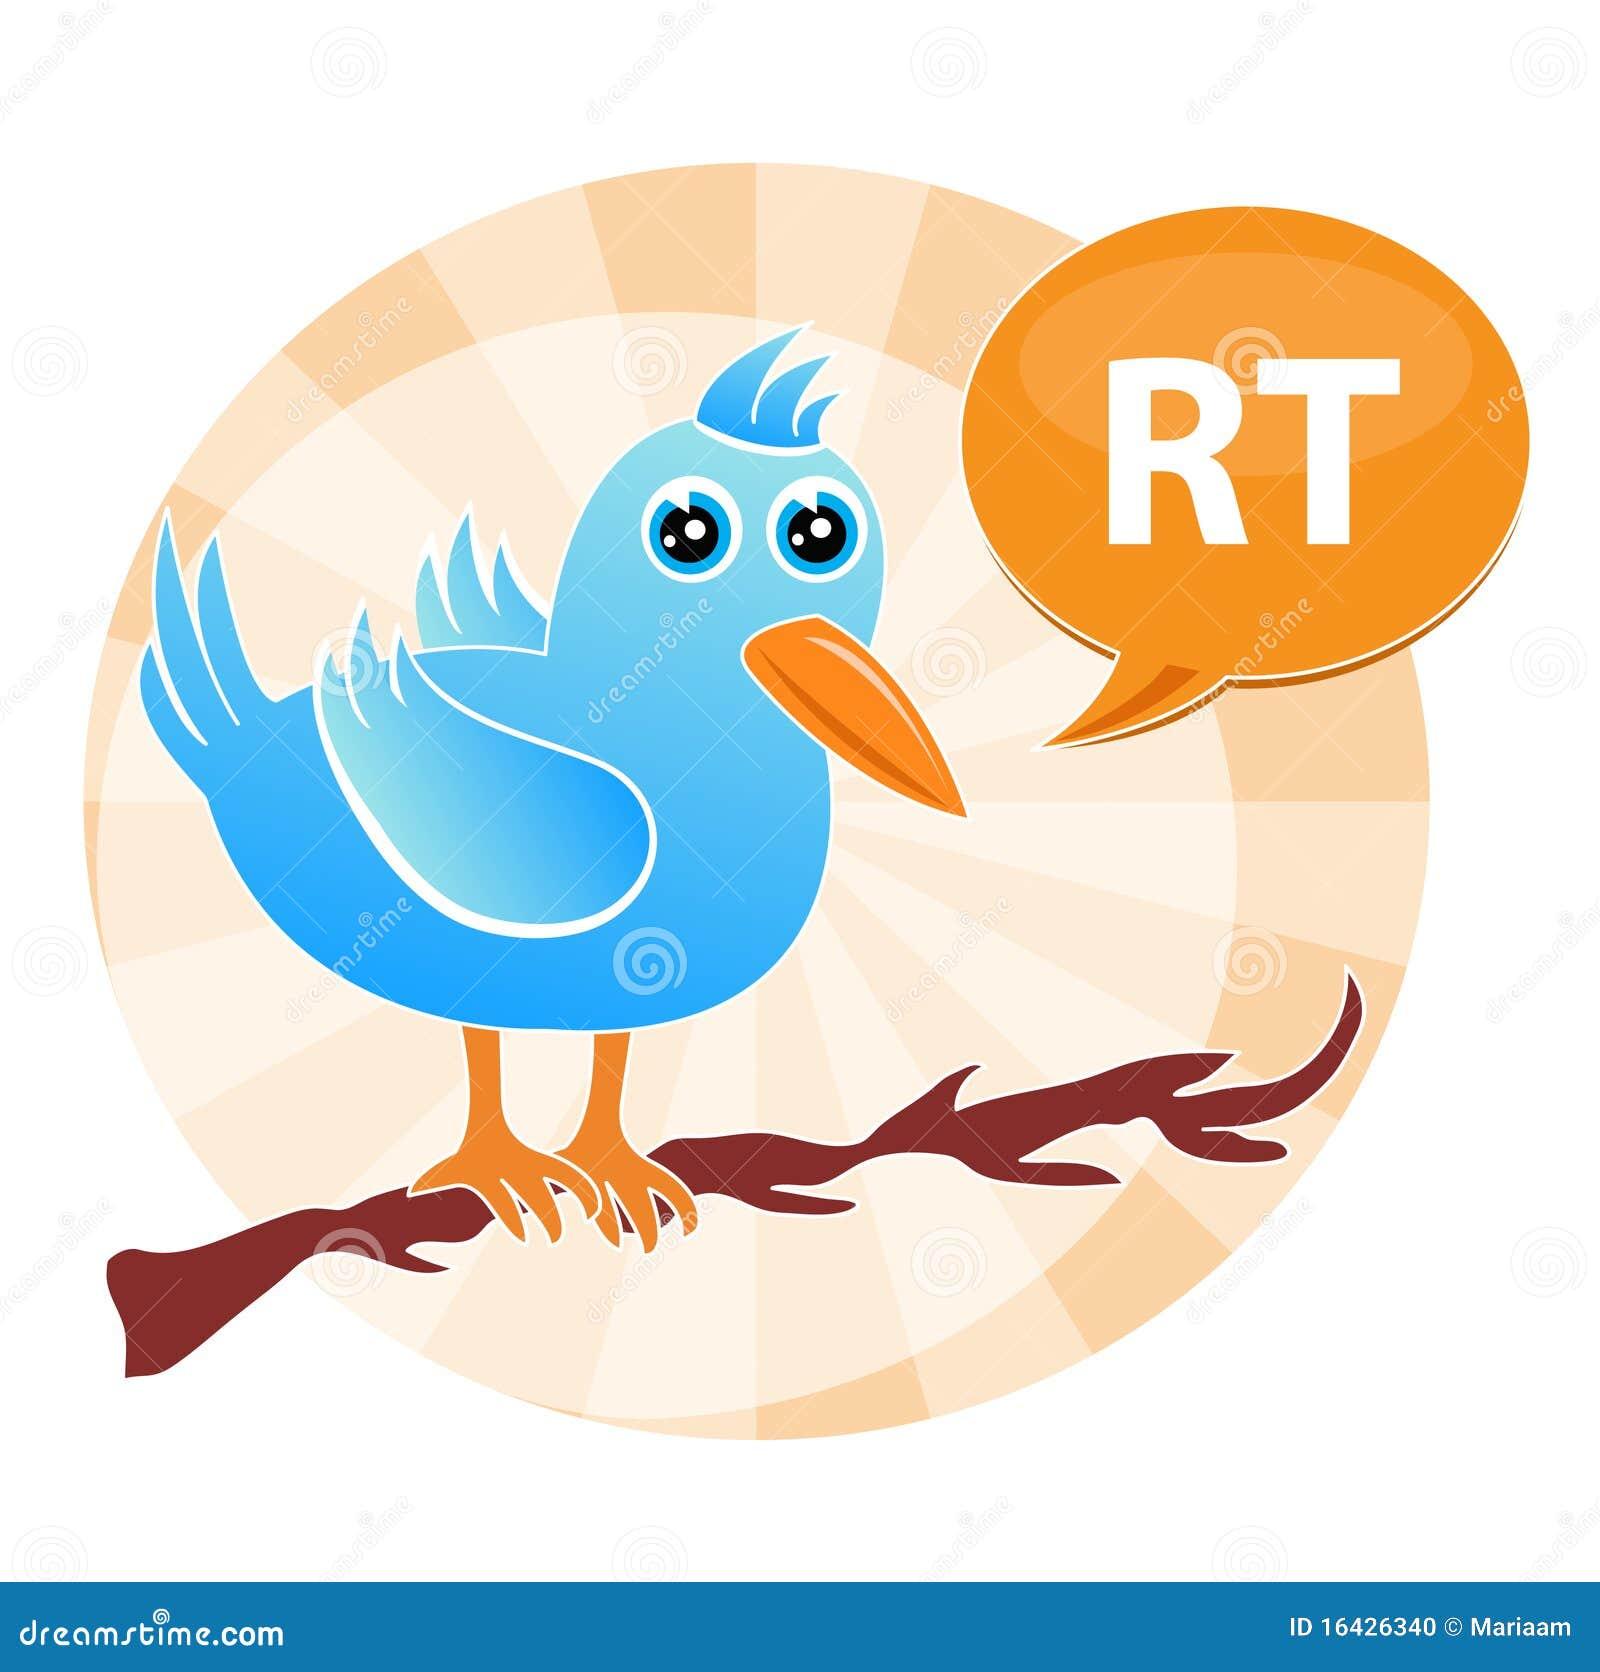 Tweet e Retweet